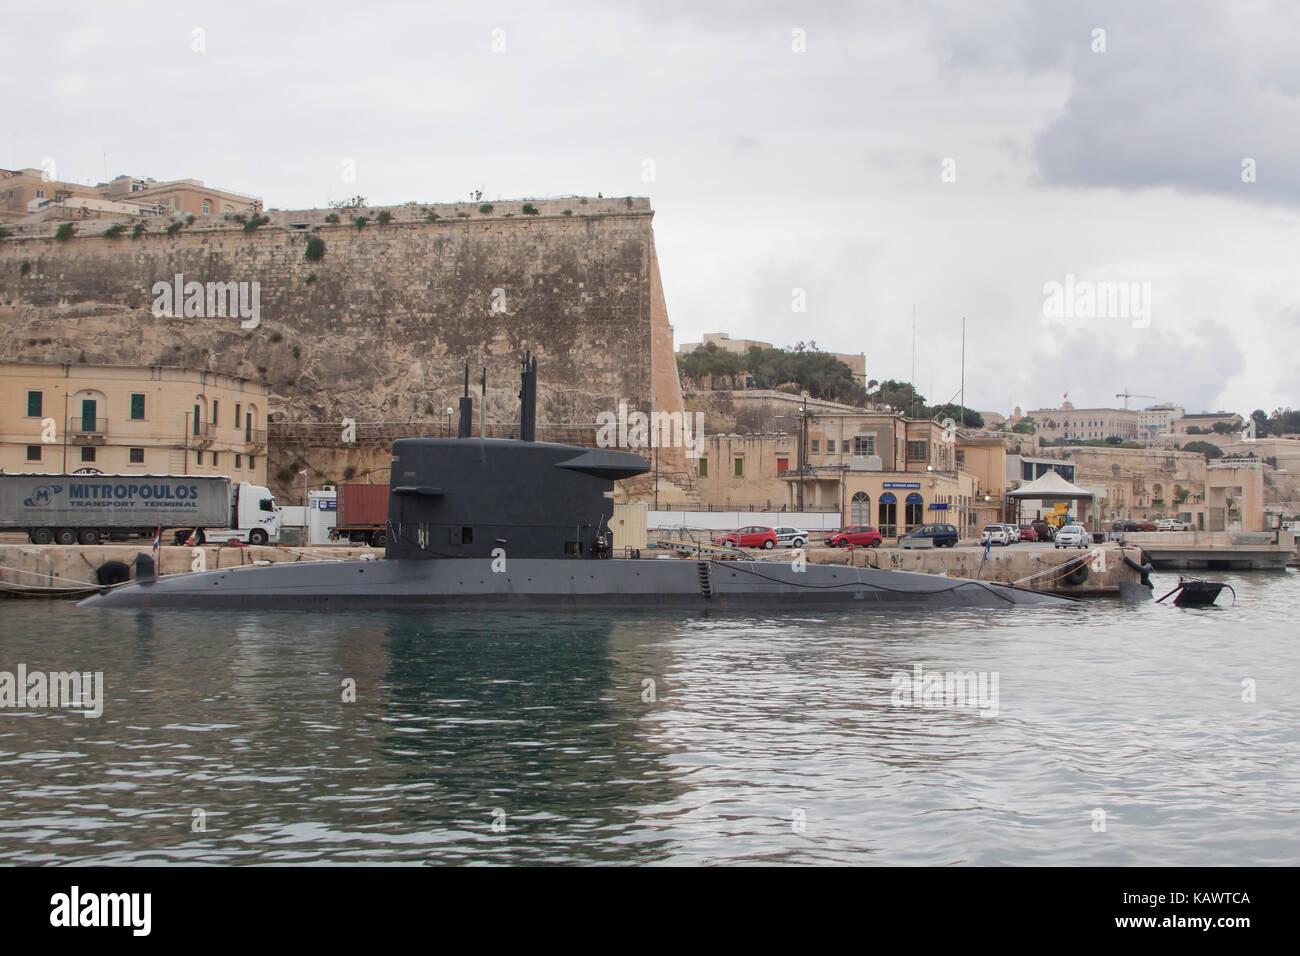 HNLMS Walrus S802 Submarine of Royal Netherlands Navy moored in the Grand Harbour Valatta Malta - Stock Image